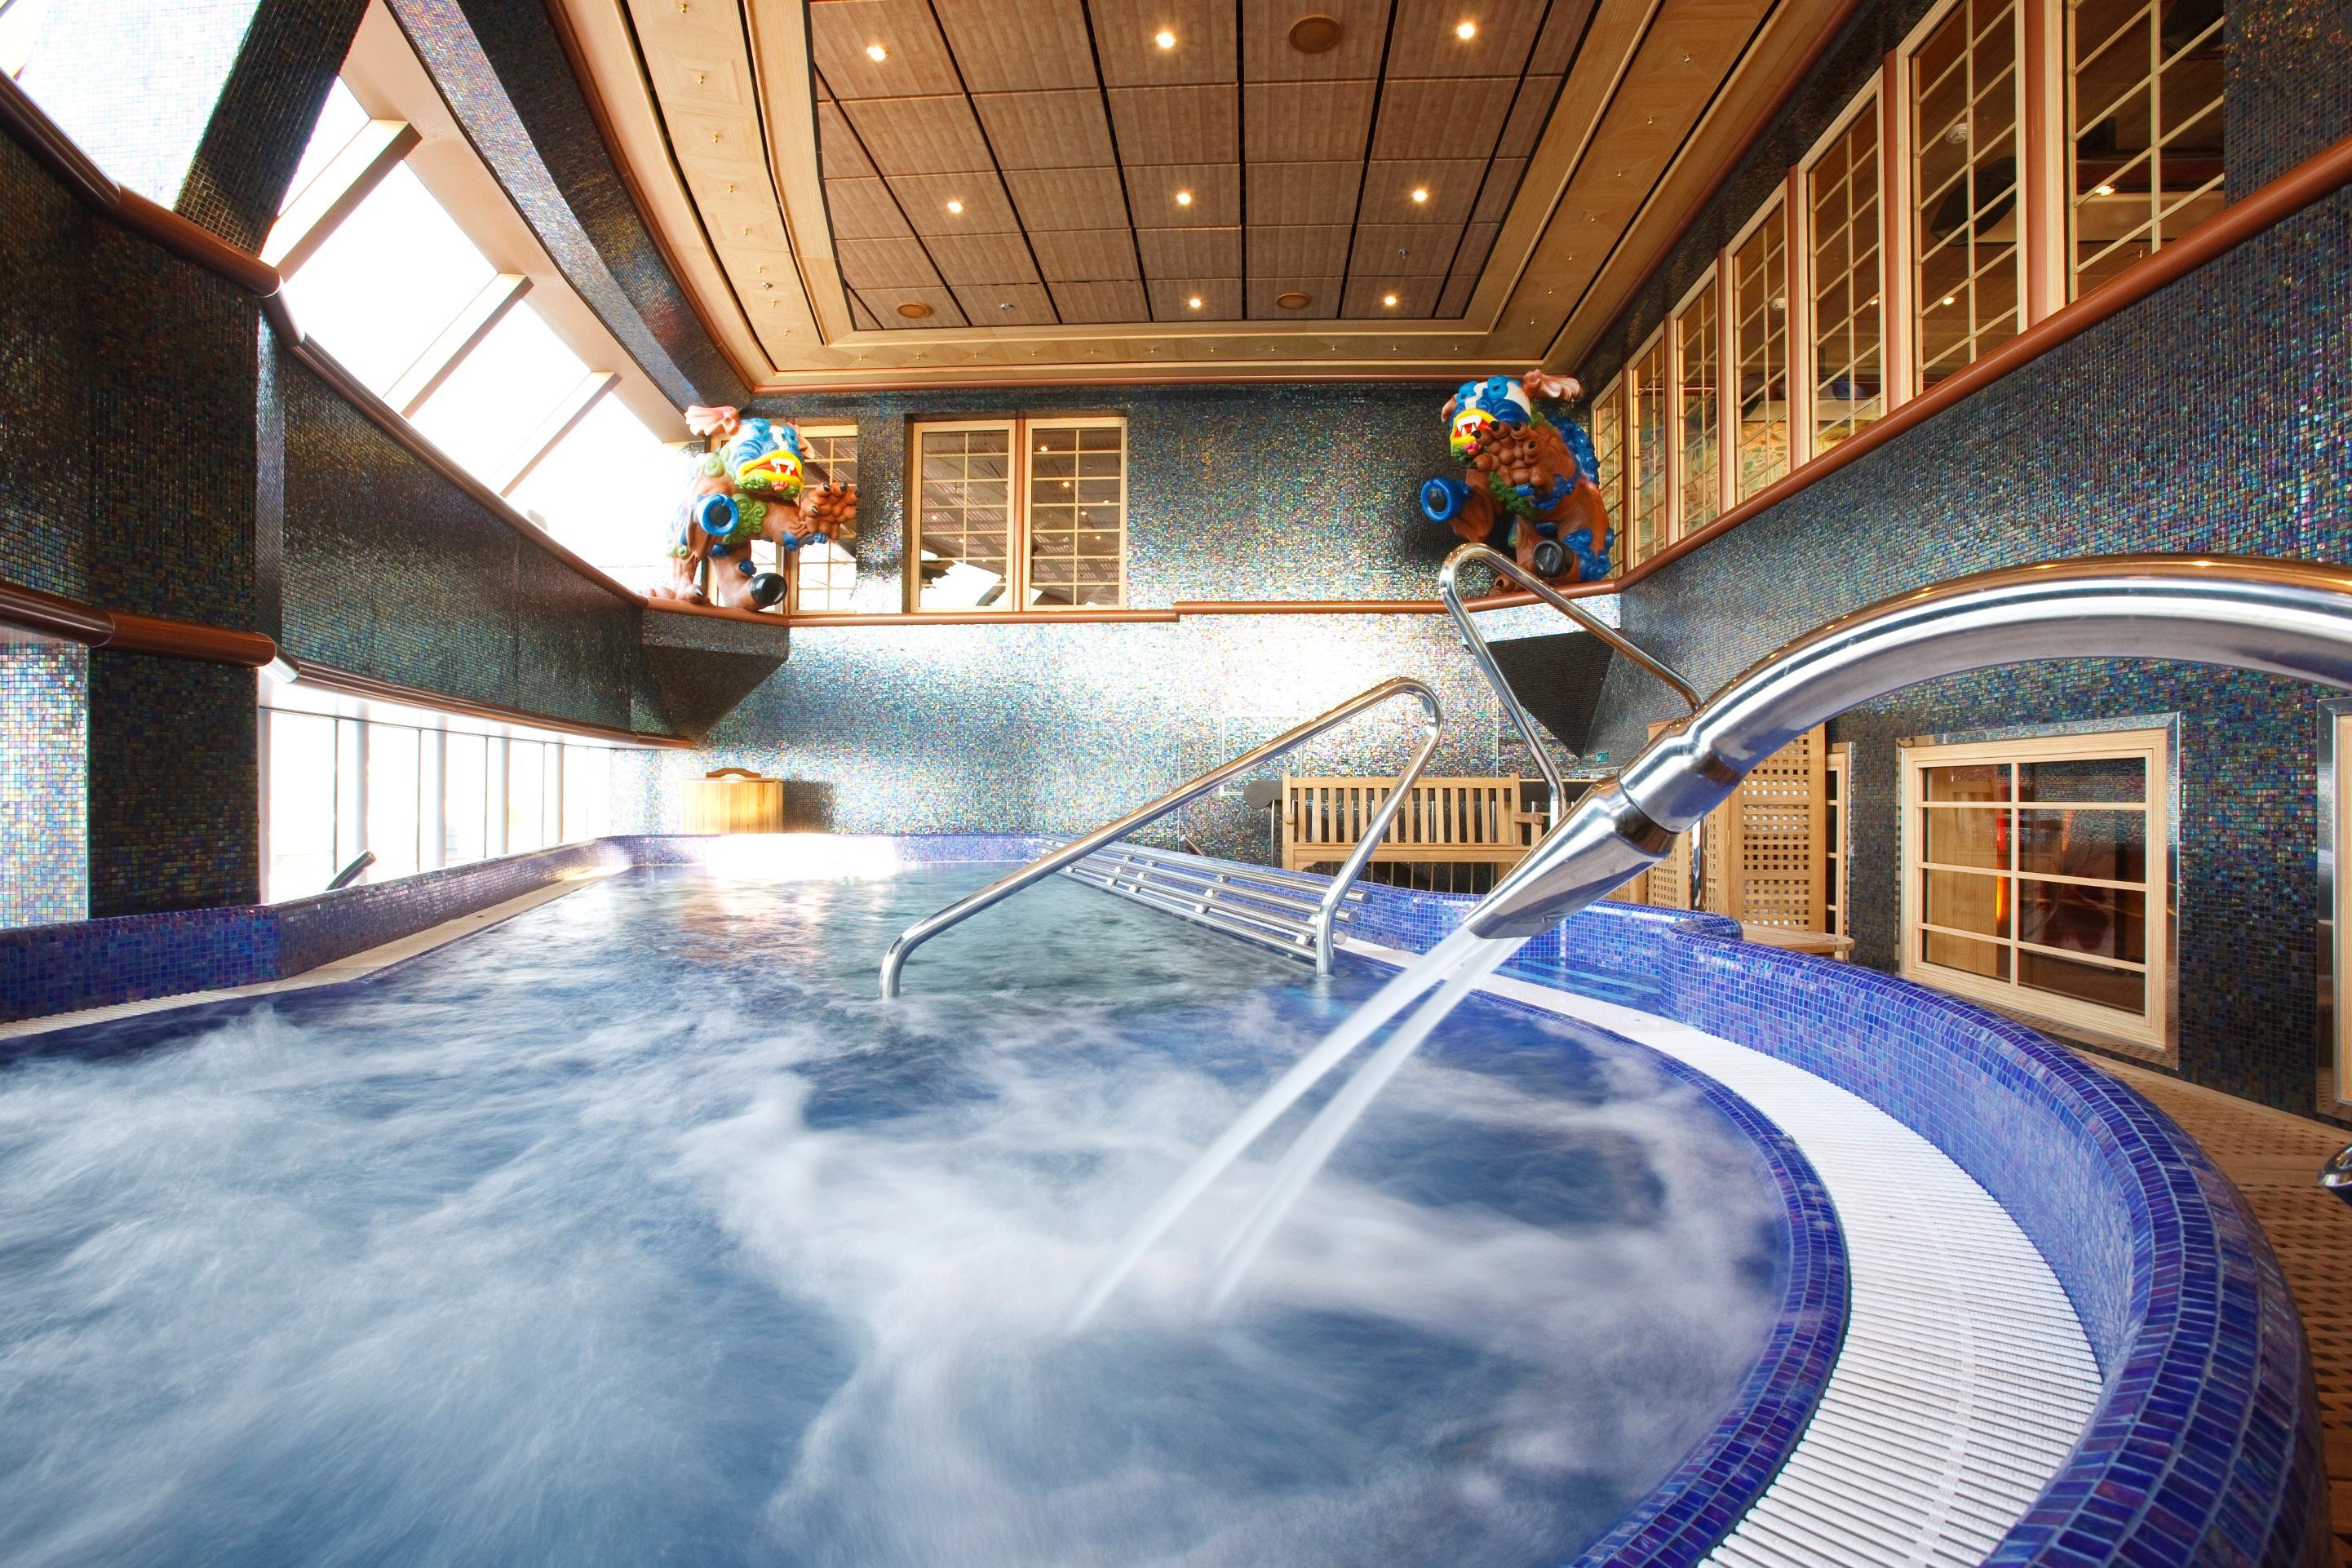 Vuelta al mundo en crucero con costa cruceros - Costa luminosa piscine ...